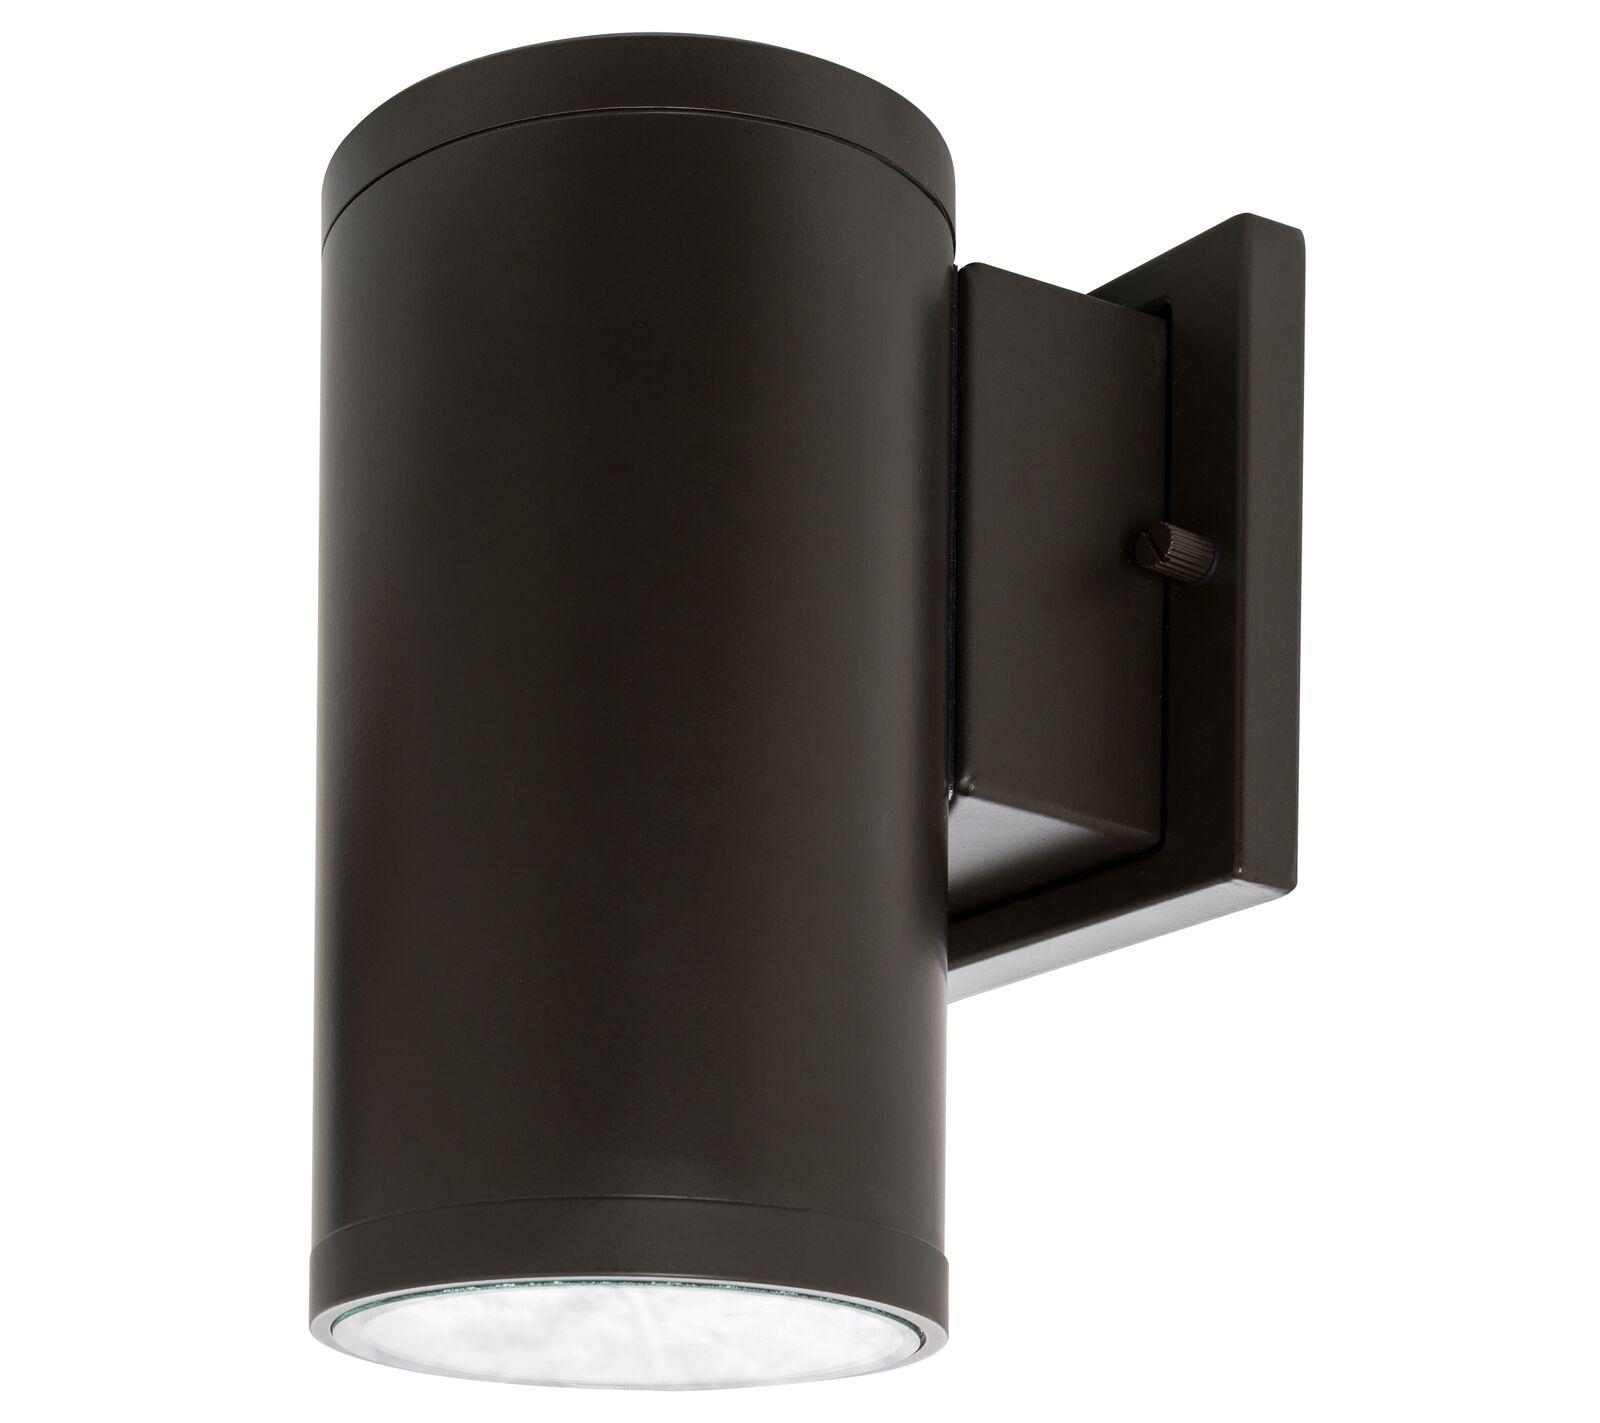 Luz Led Para Exterior Cilindro Westgate-Up Down Lámpara De Parojo Lámpara Accesorio